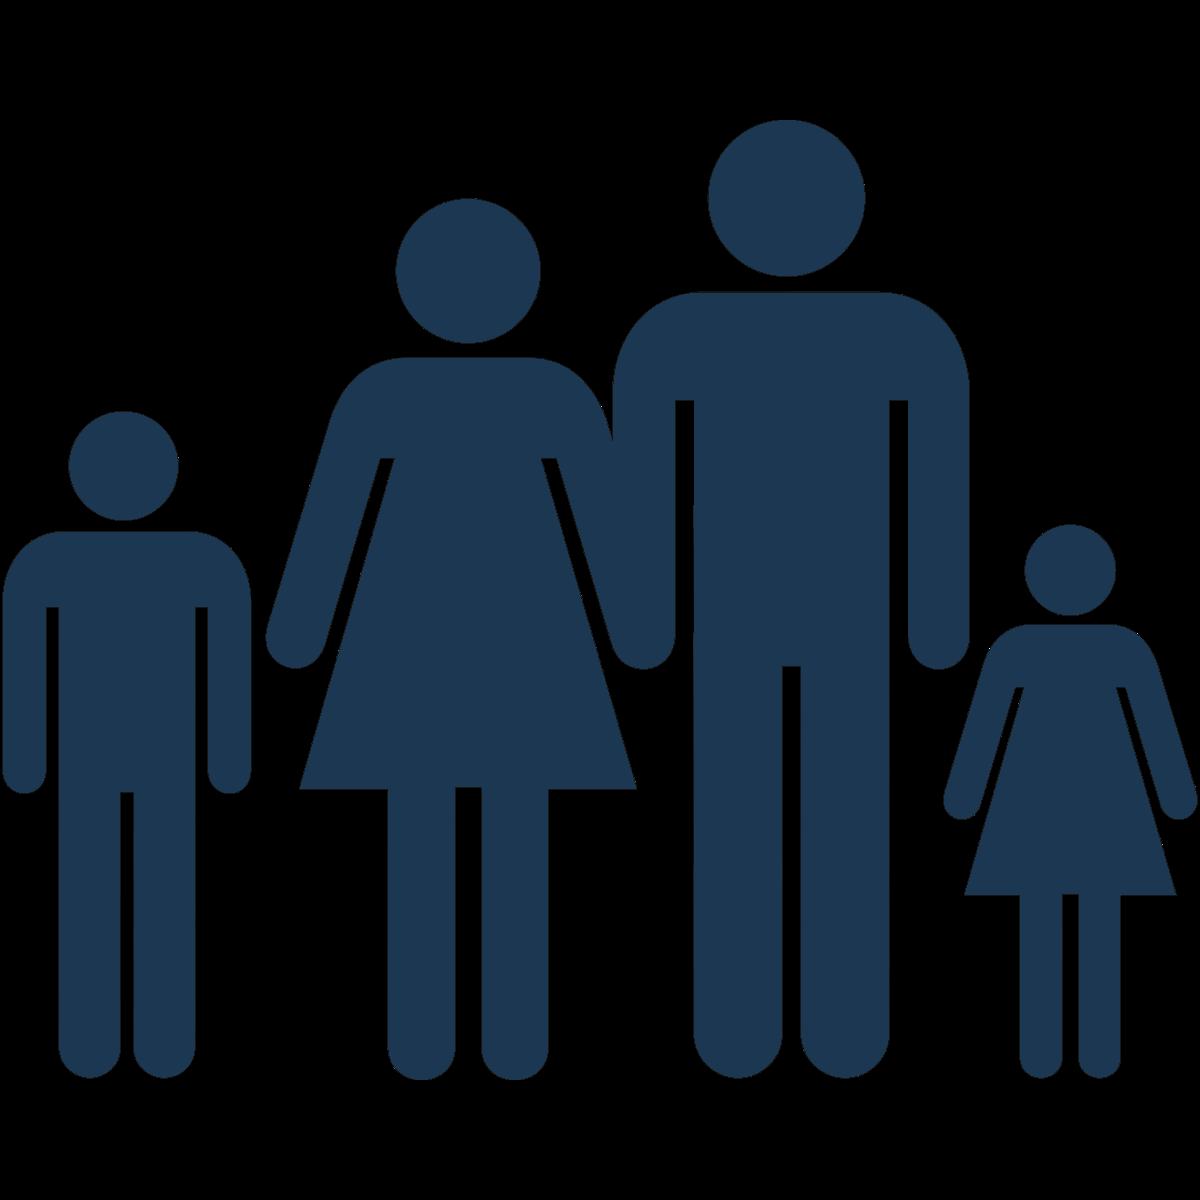 FAMILY-ICON-2-SHIELD-BLUE (1)